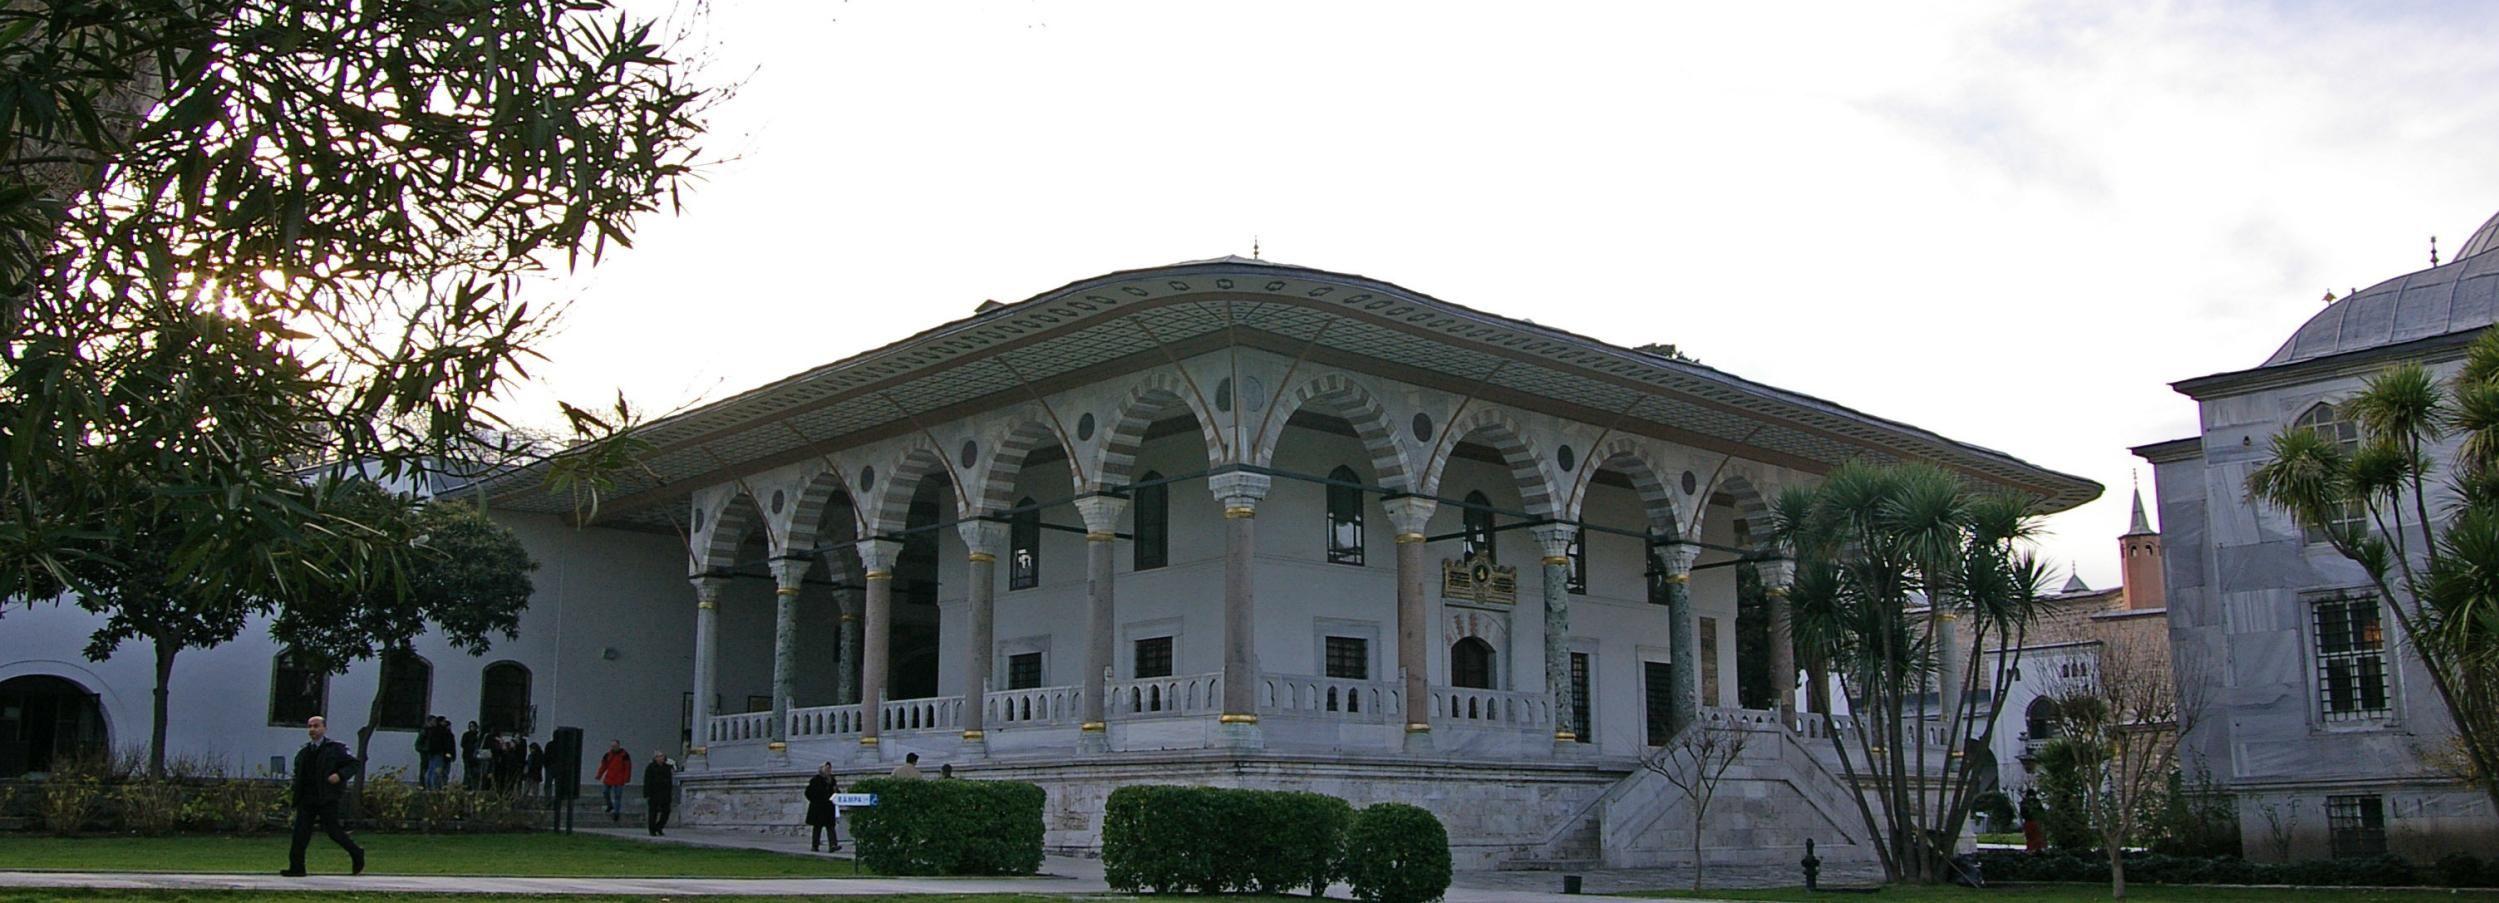 Estambul: tour guiado sin colas al Palacio de Topkapı